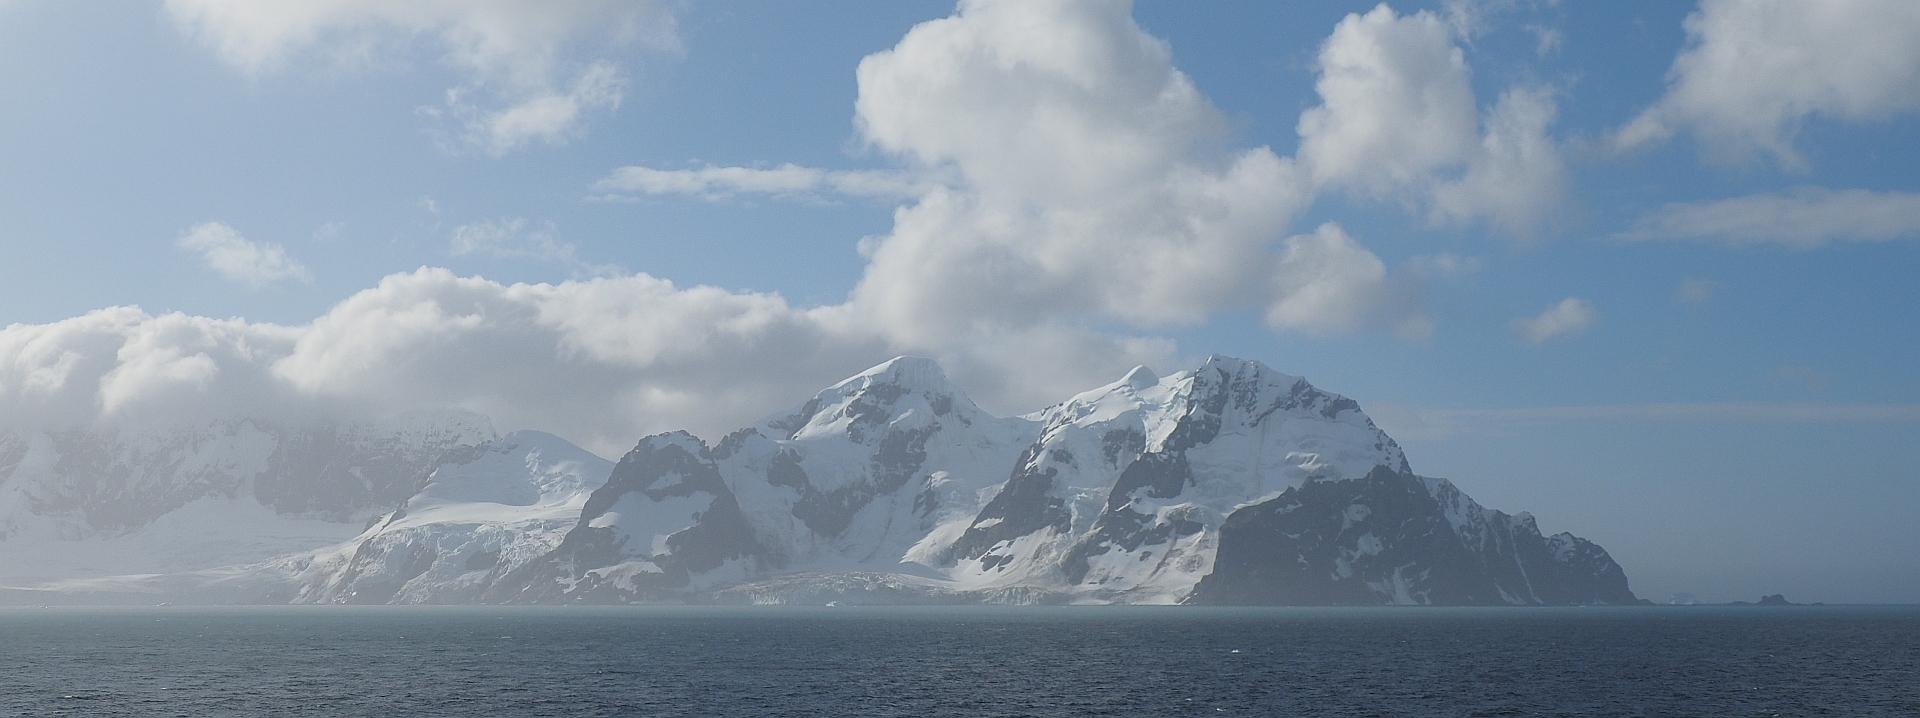 Antarkits Elephant Island